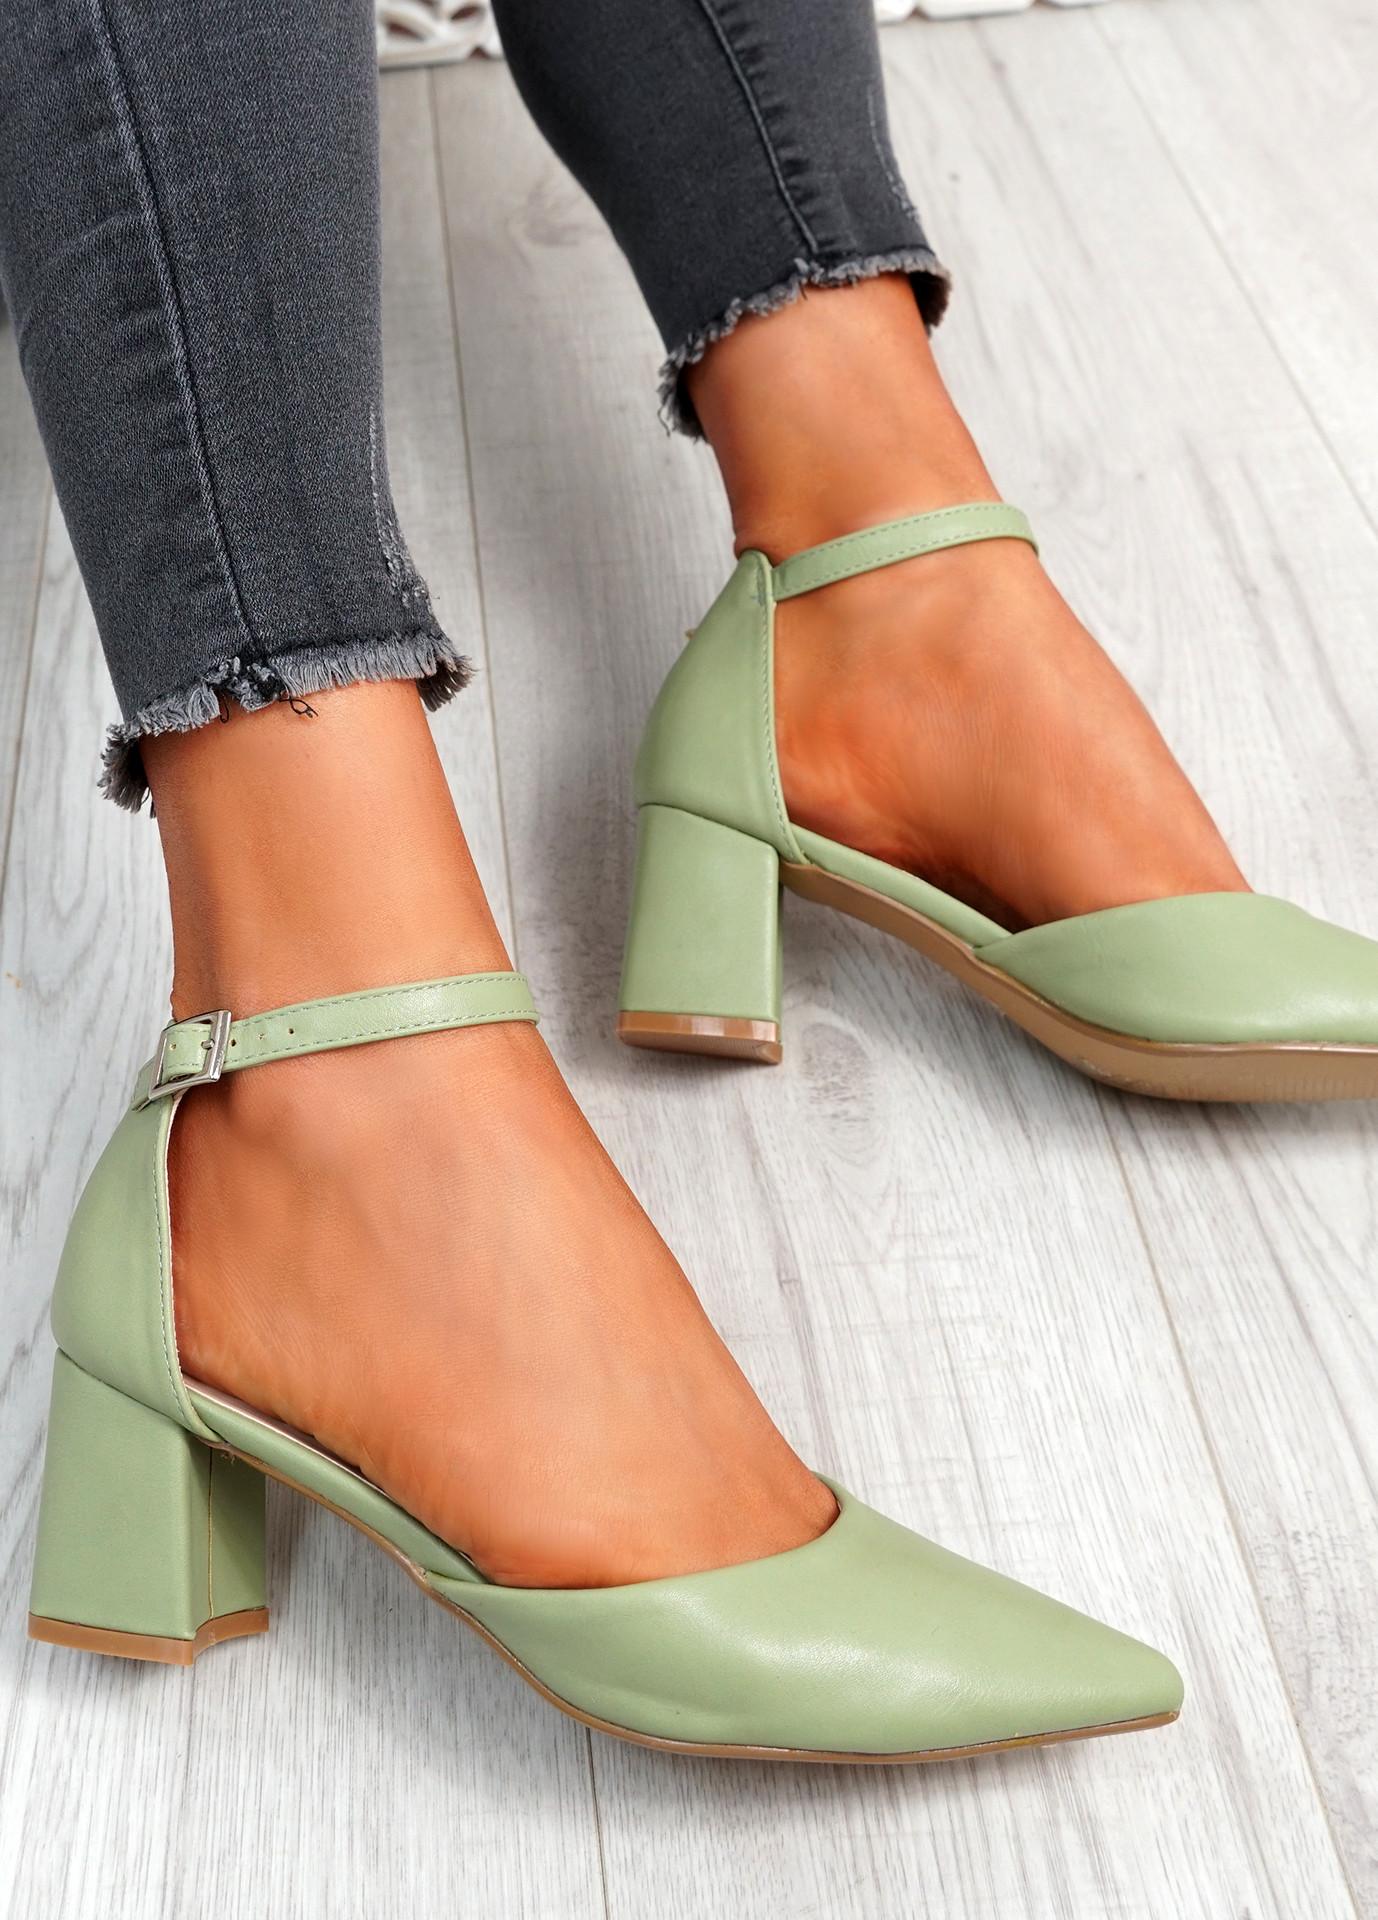 Mya Green Block Heel Ankle Strap Pumps